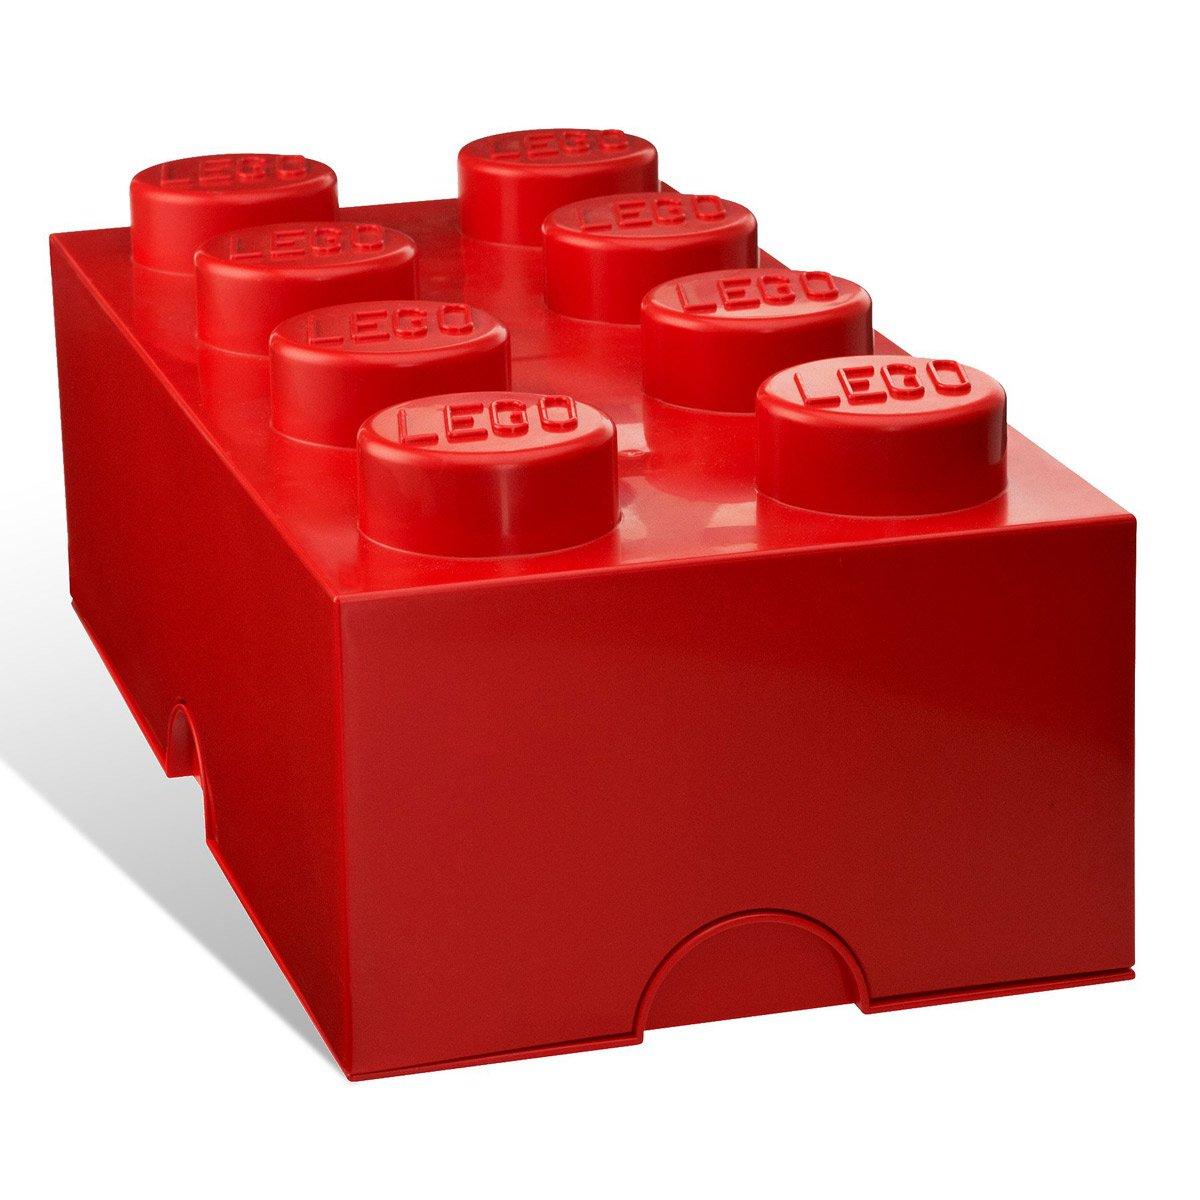 Massive lego stackable storage bricks the green head - Lego boite rangement ...